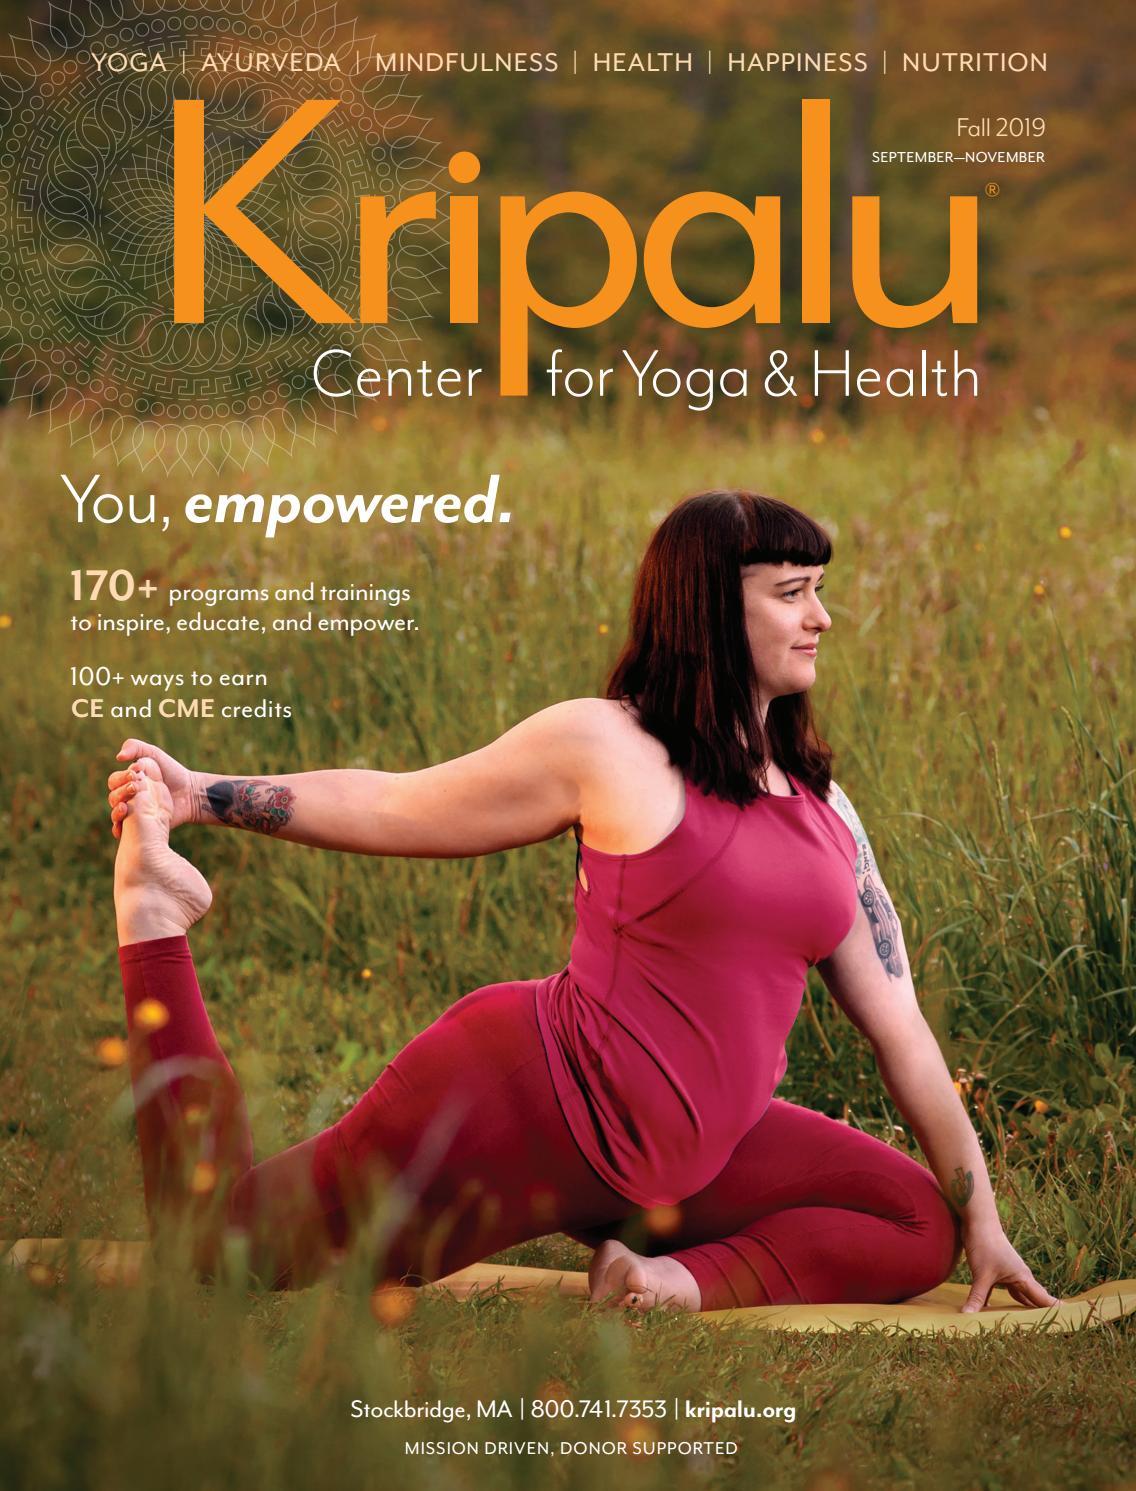 Kripalu Fall Catalog 2019 by Kripalu Center for Yoga & Health - issuu